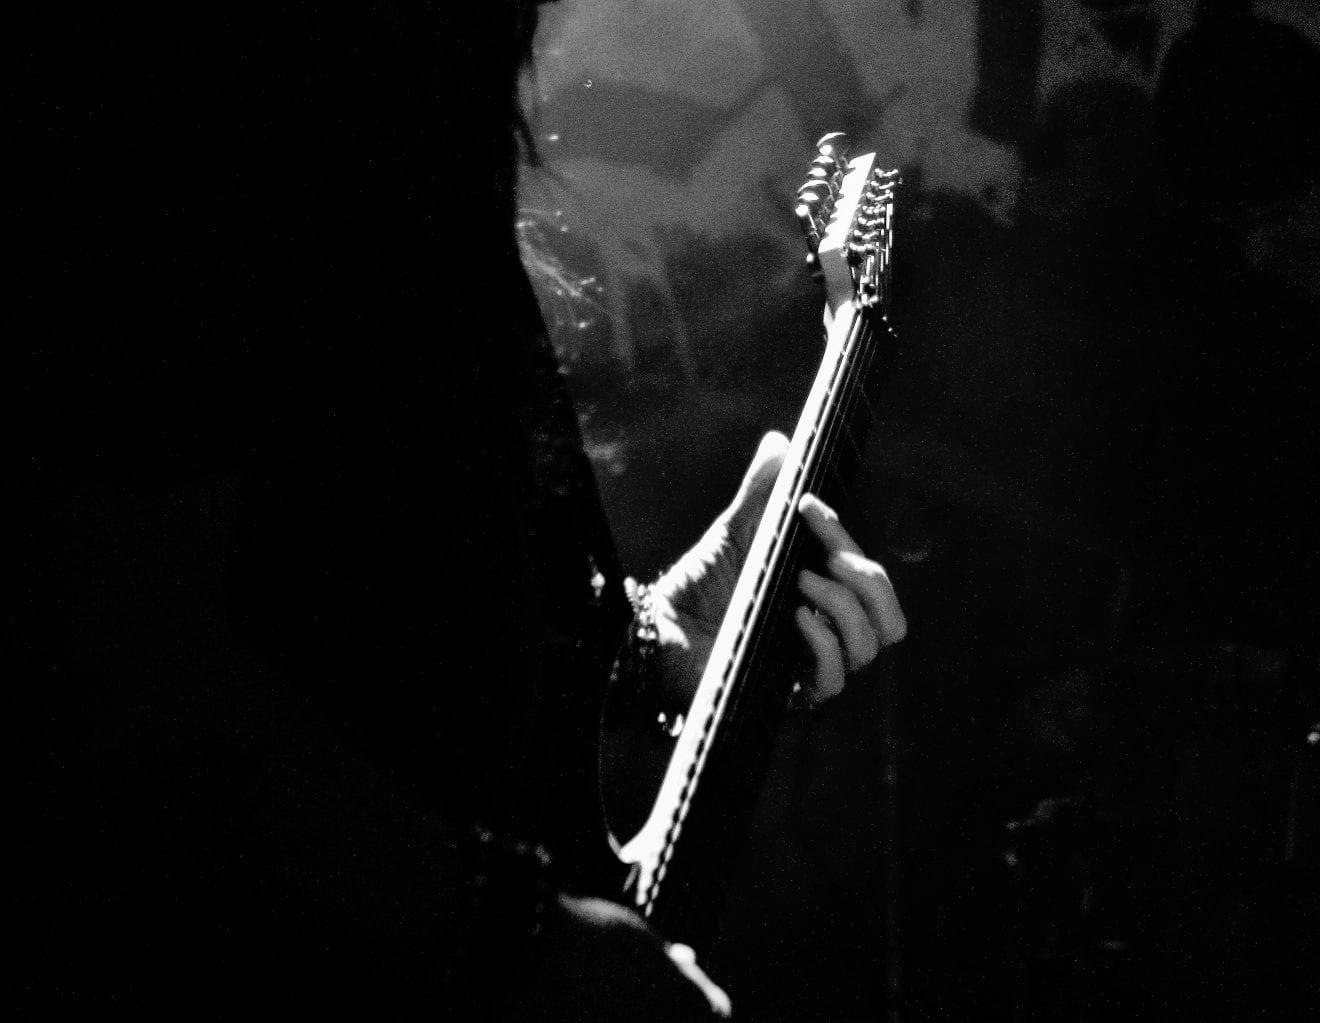 HiFi Klubben i Odense inviterer til gratis intimkoncert i mørke